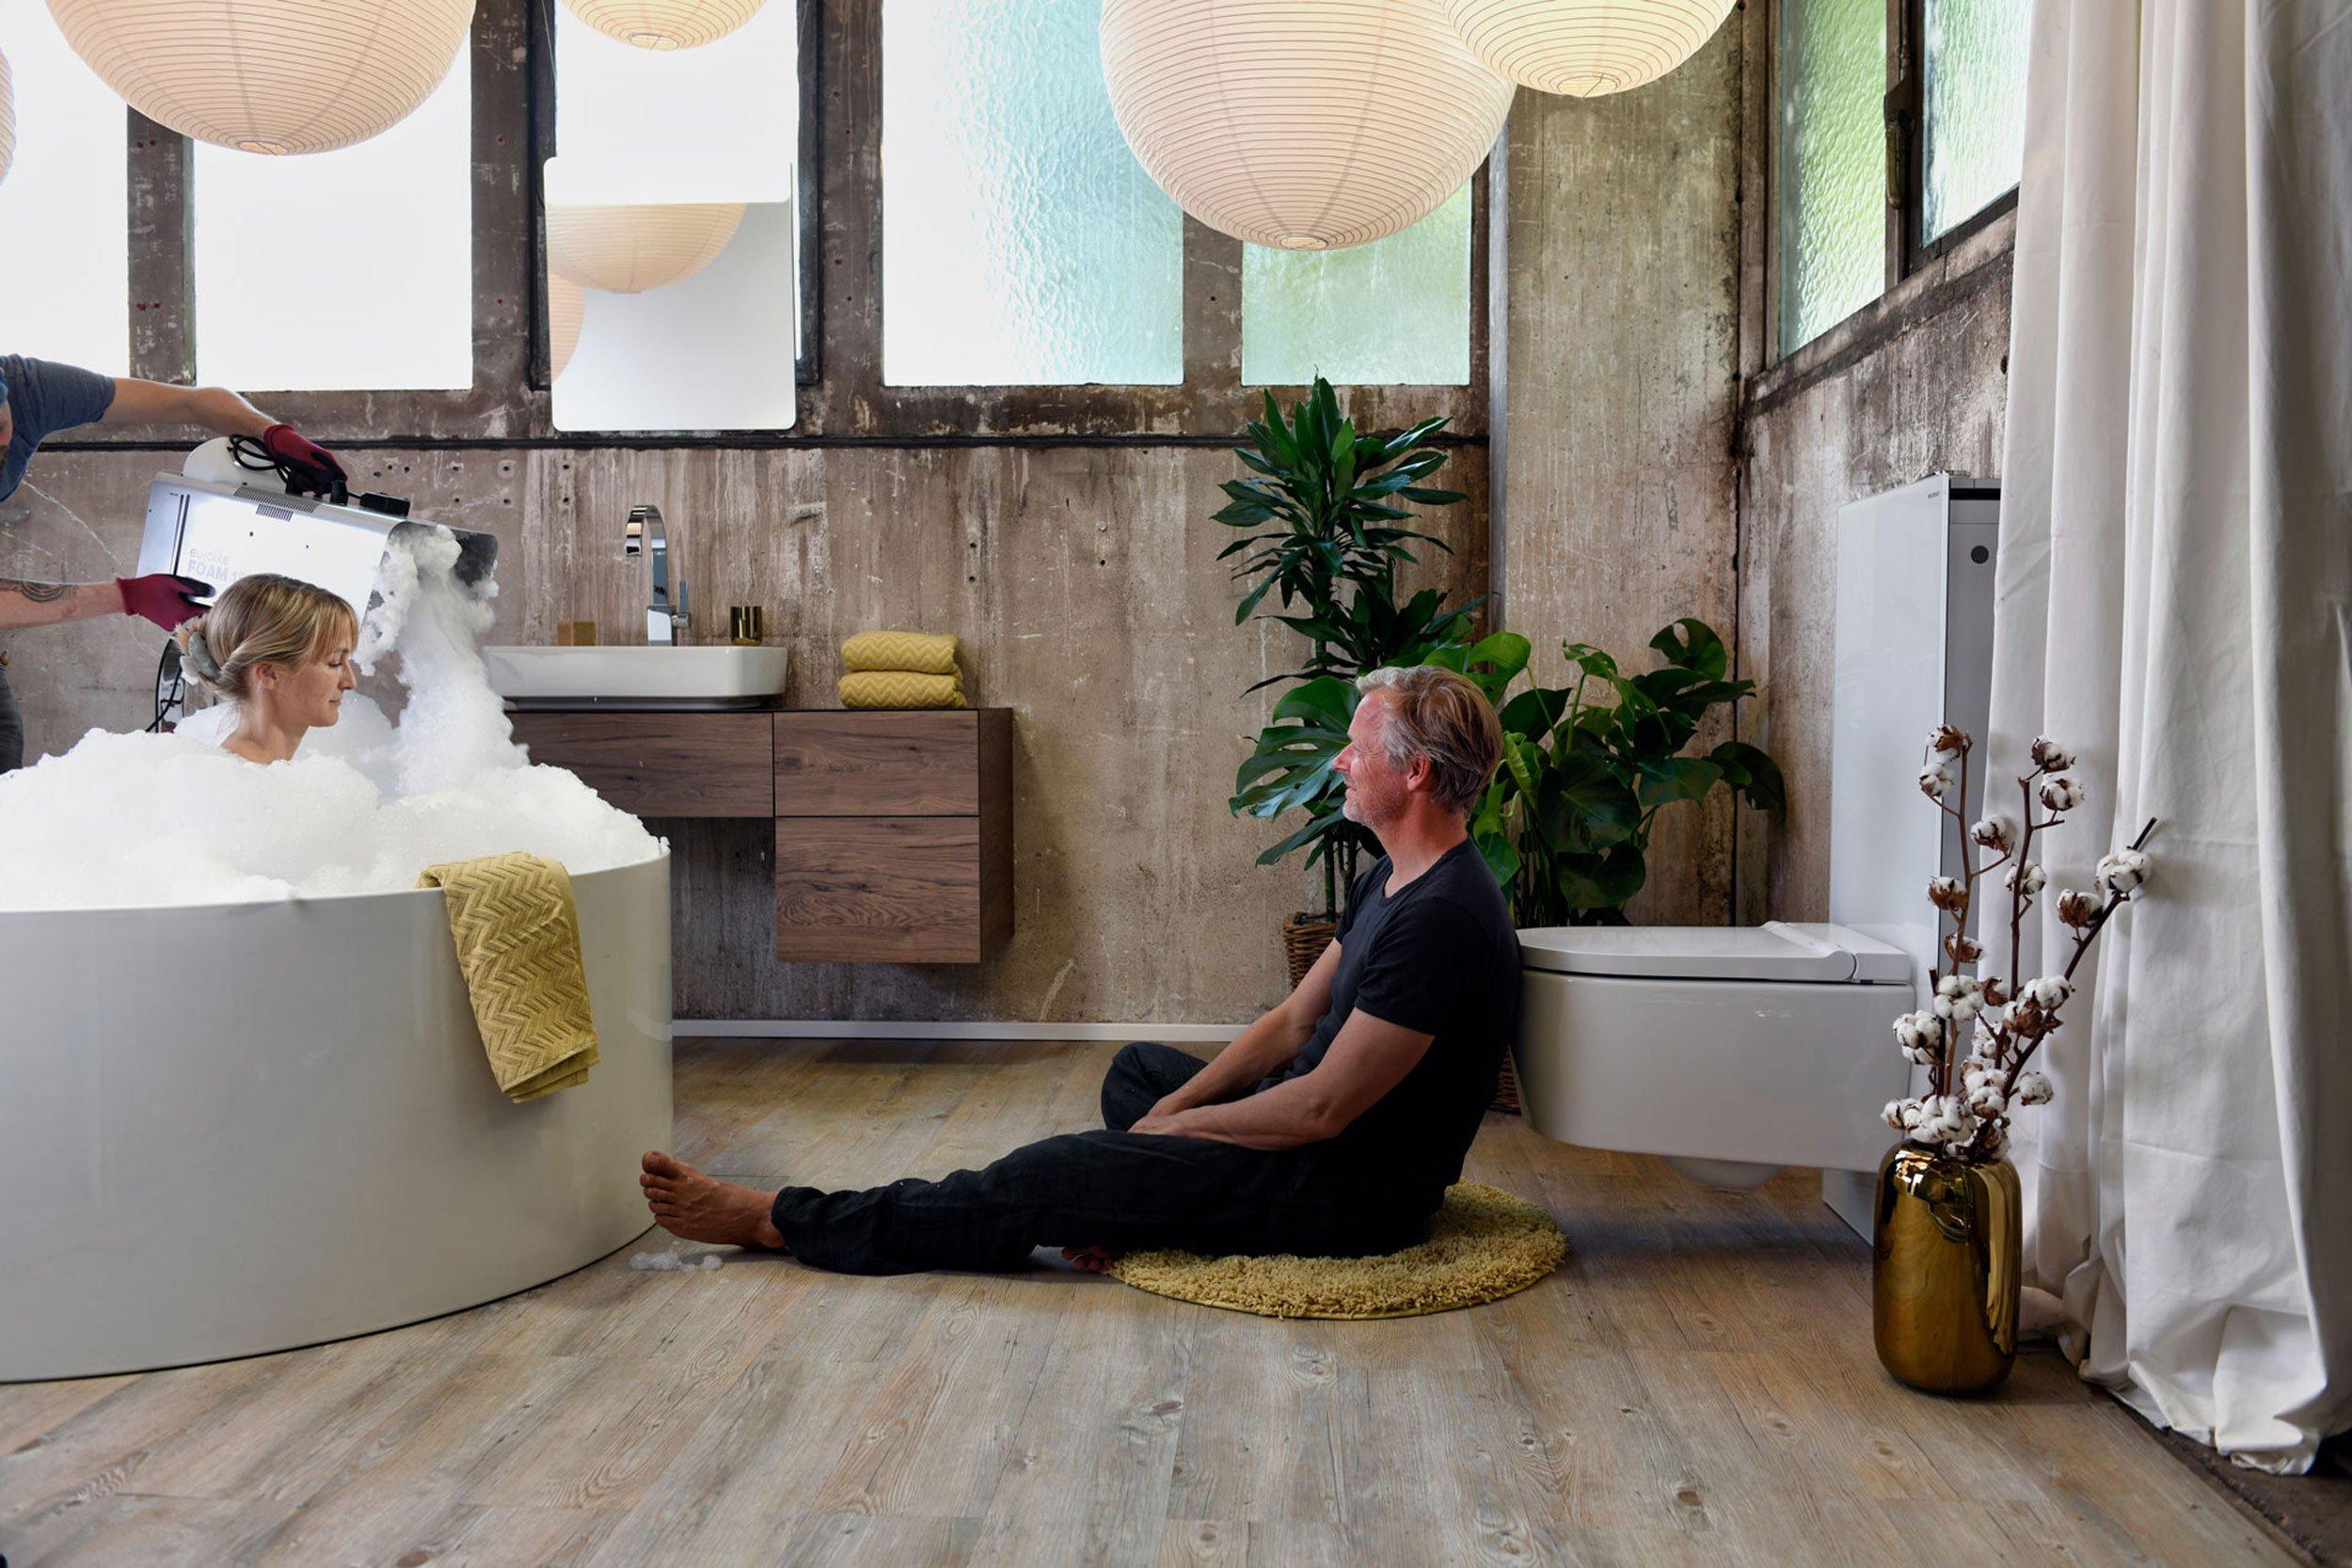 https://farconsulting.de/wp-content/uploads/2020/11/03_Making_of_Inside_Outside_Pop_up_my_bathroom.jpg